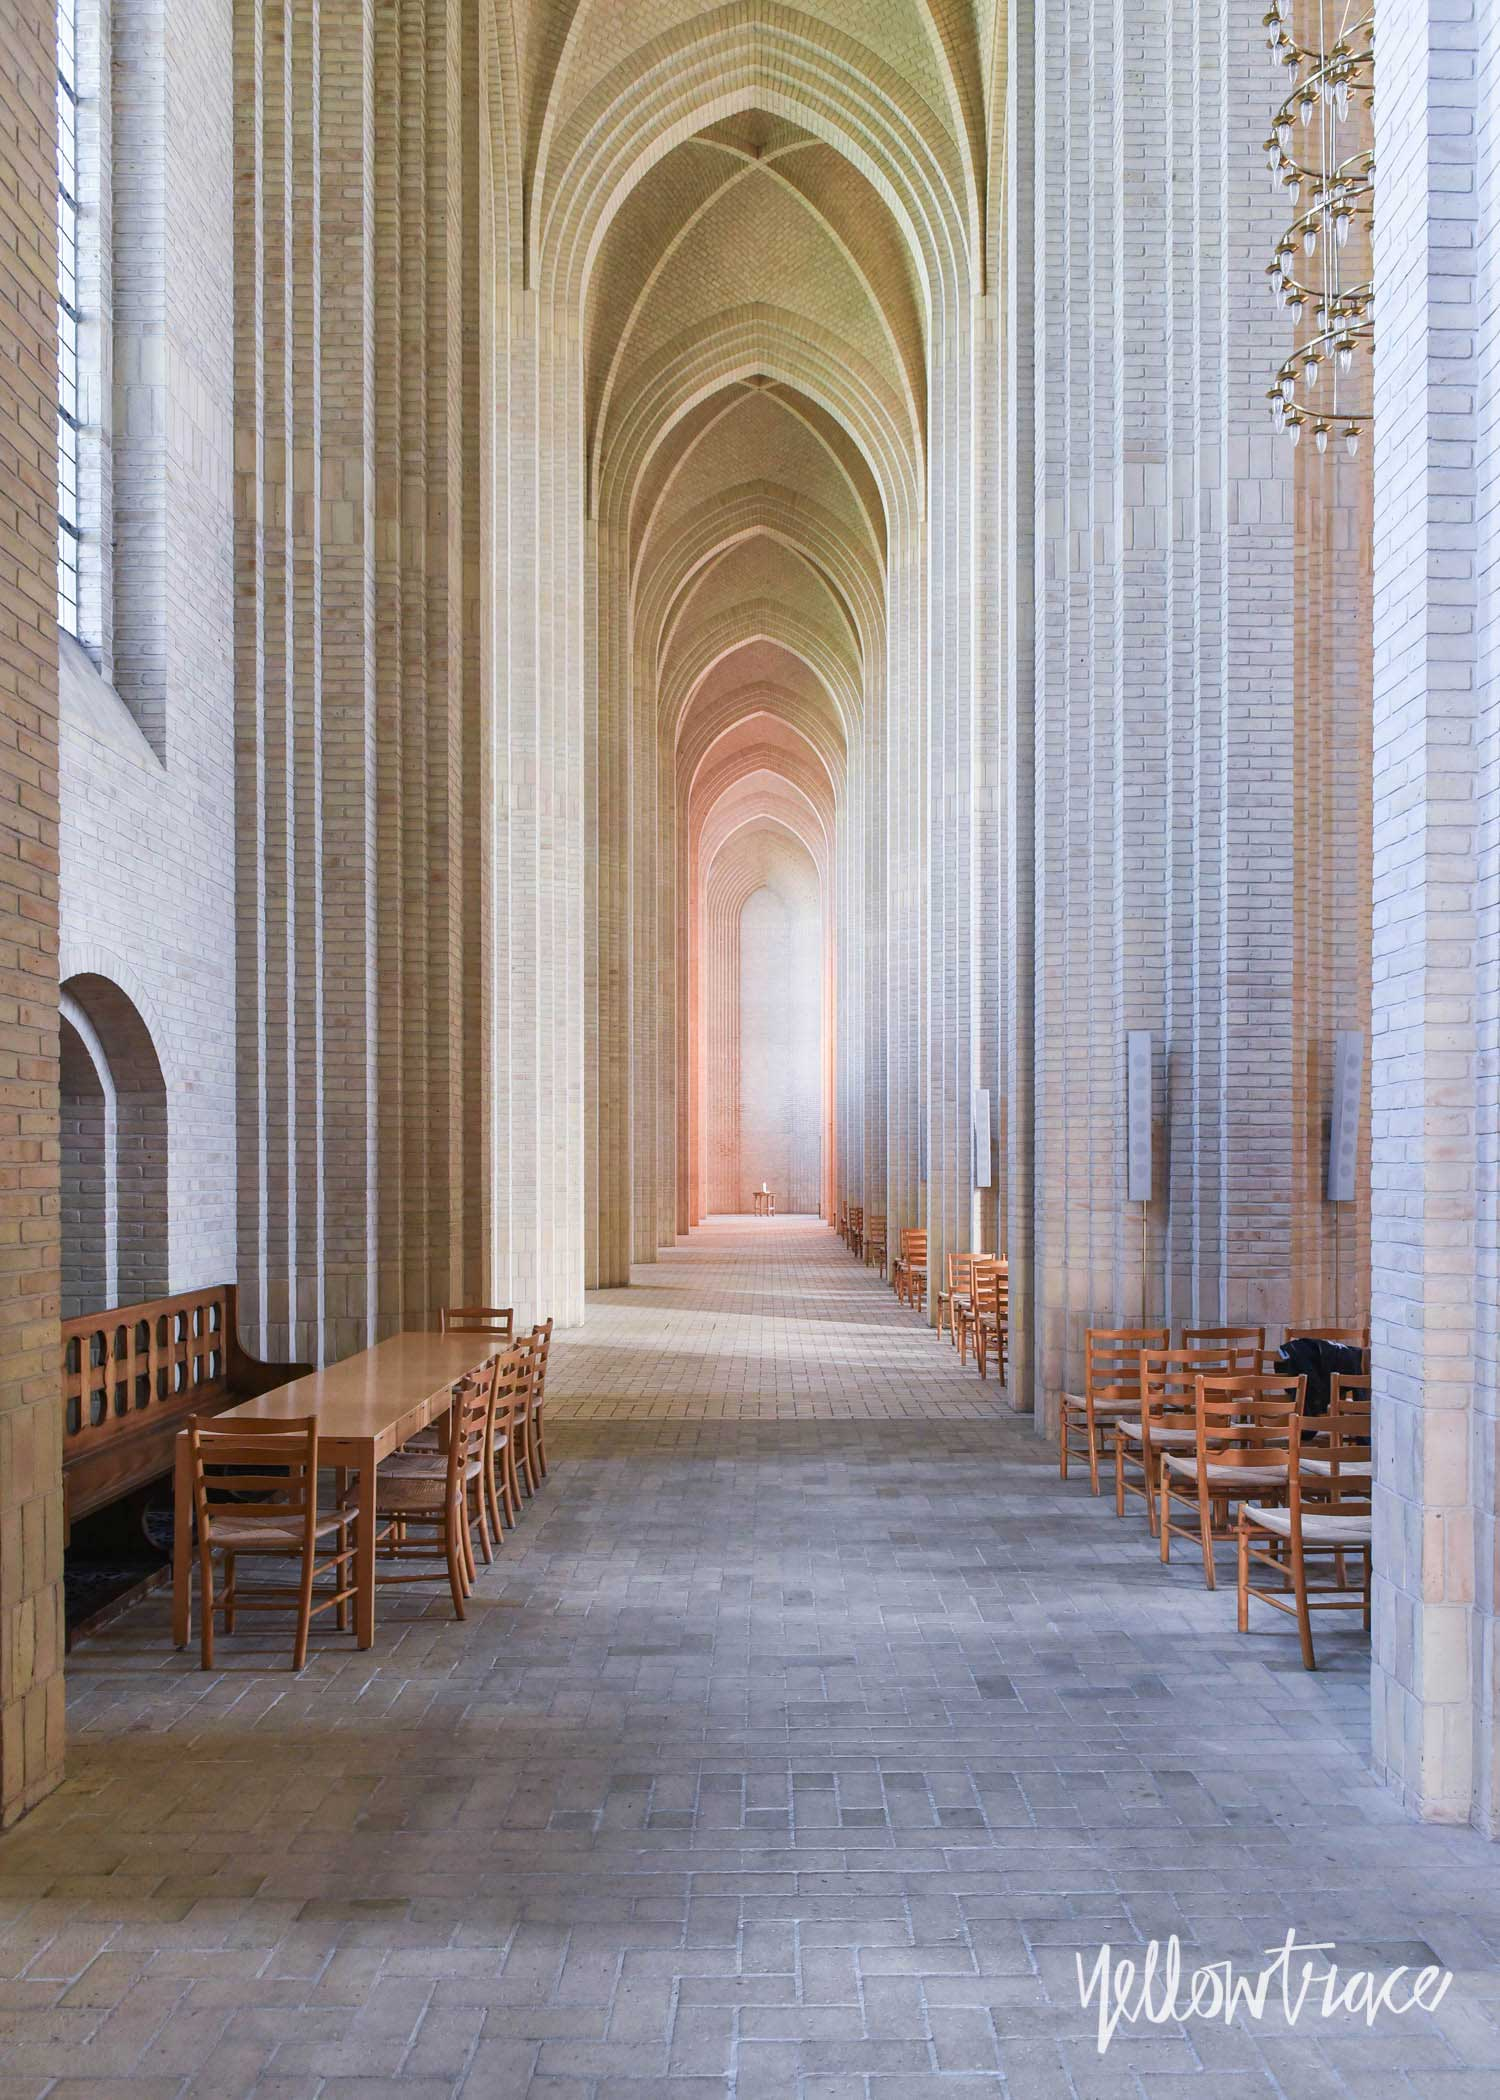 Grundtvig-Church-in-Copenhagen-Nick-Hughes-Yellowtrace-02